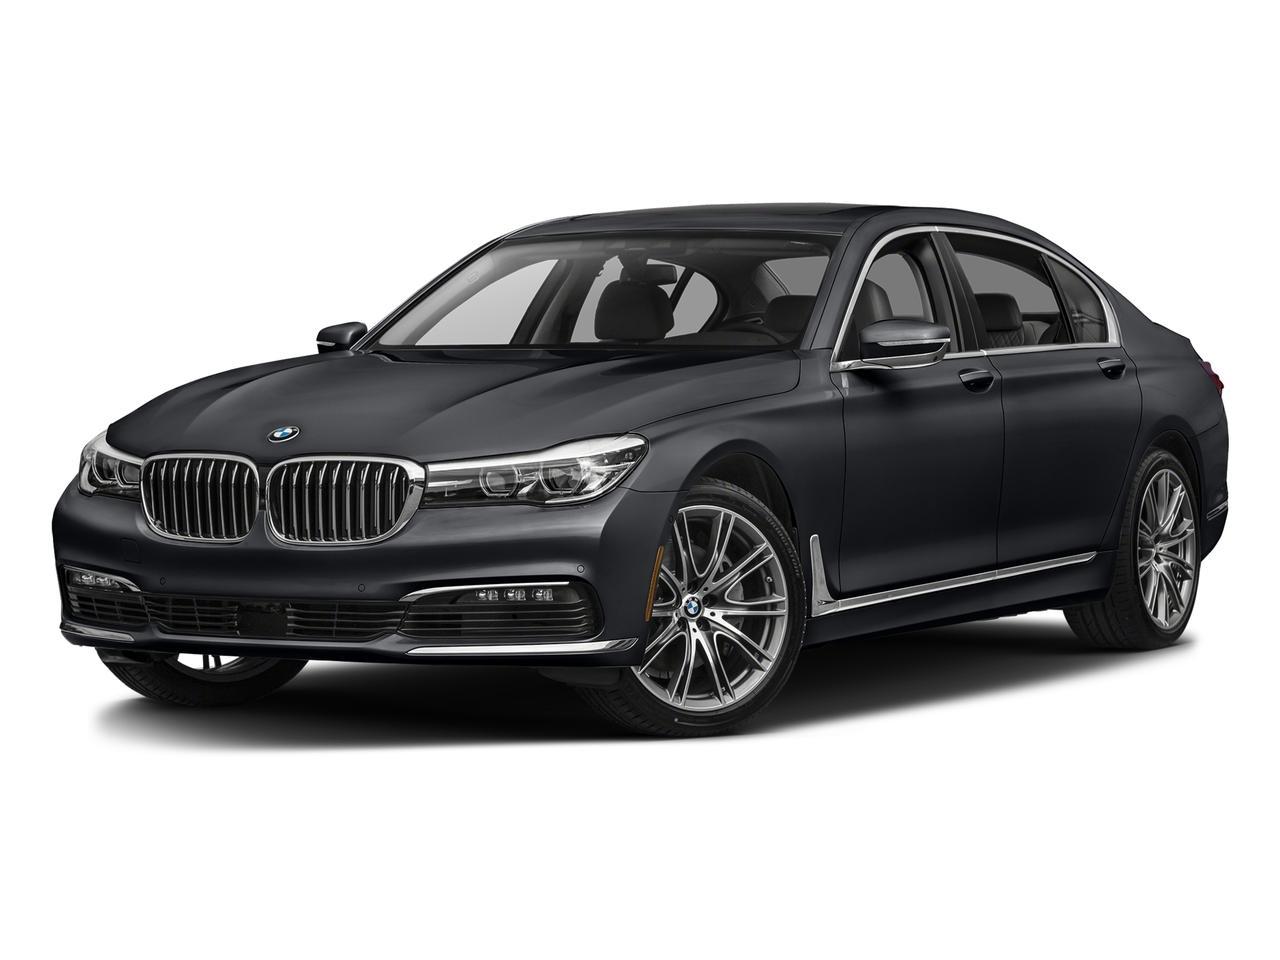 2018 BMW 740i Vehicle Photo in Charleston, SC 29407